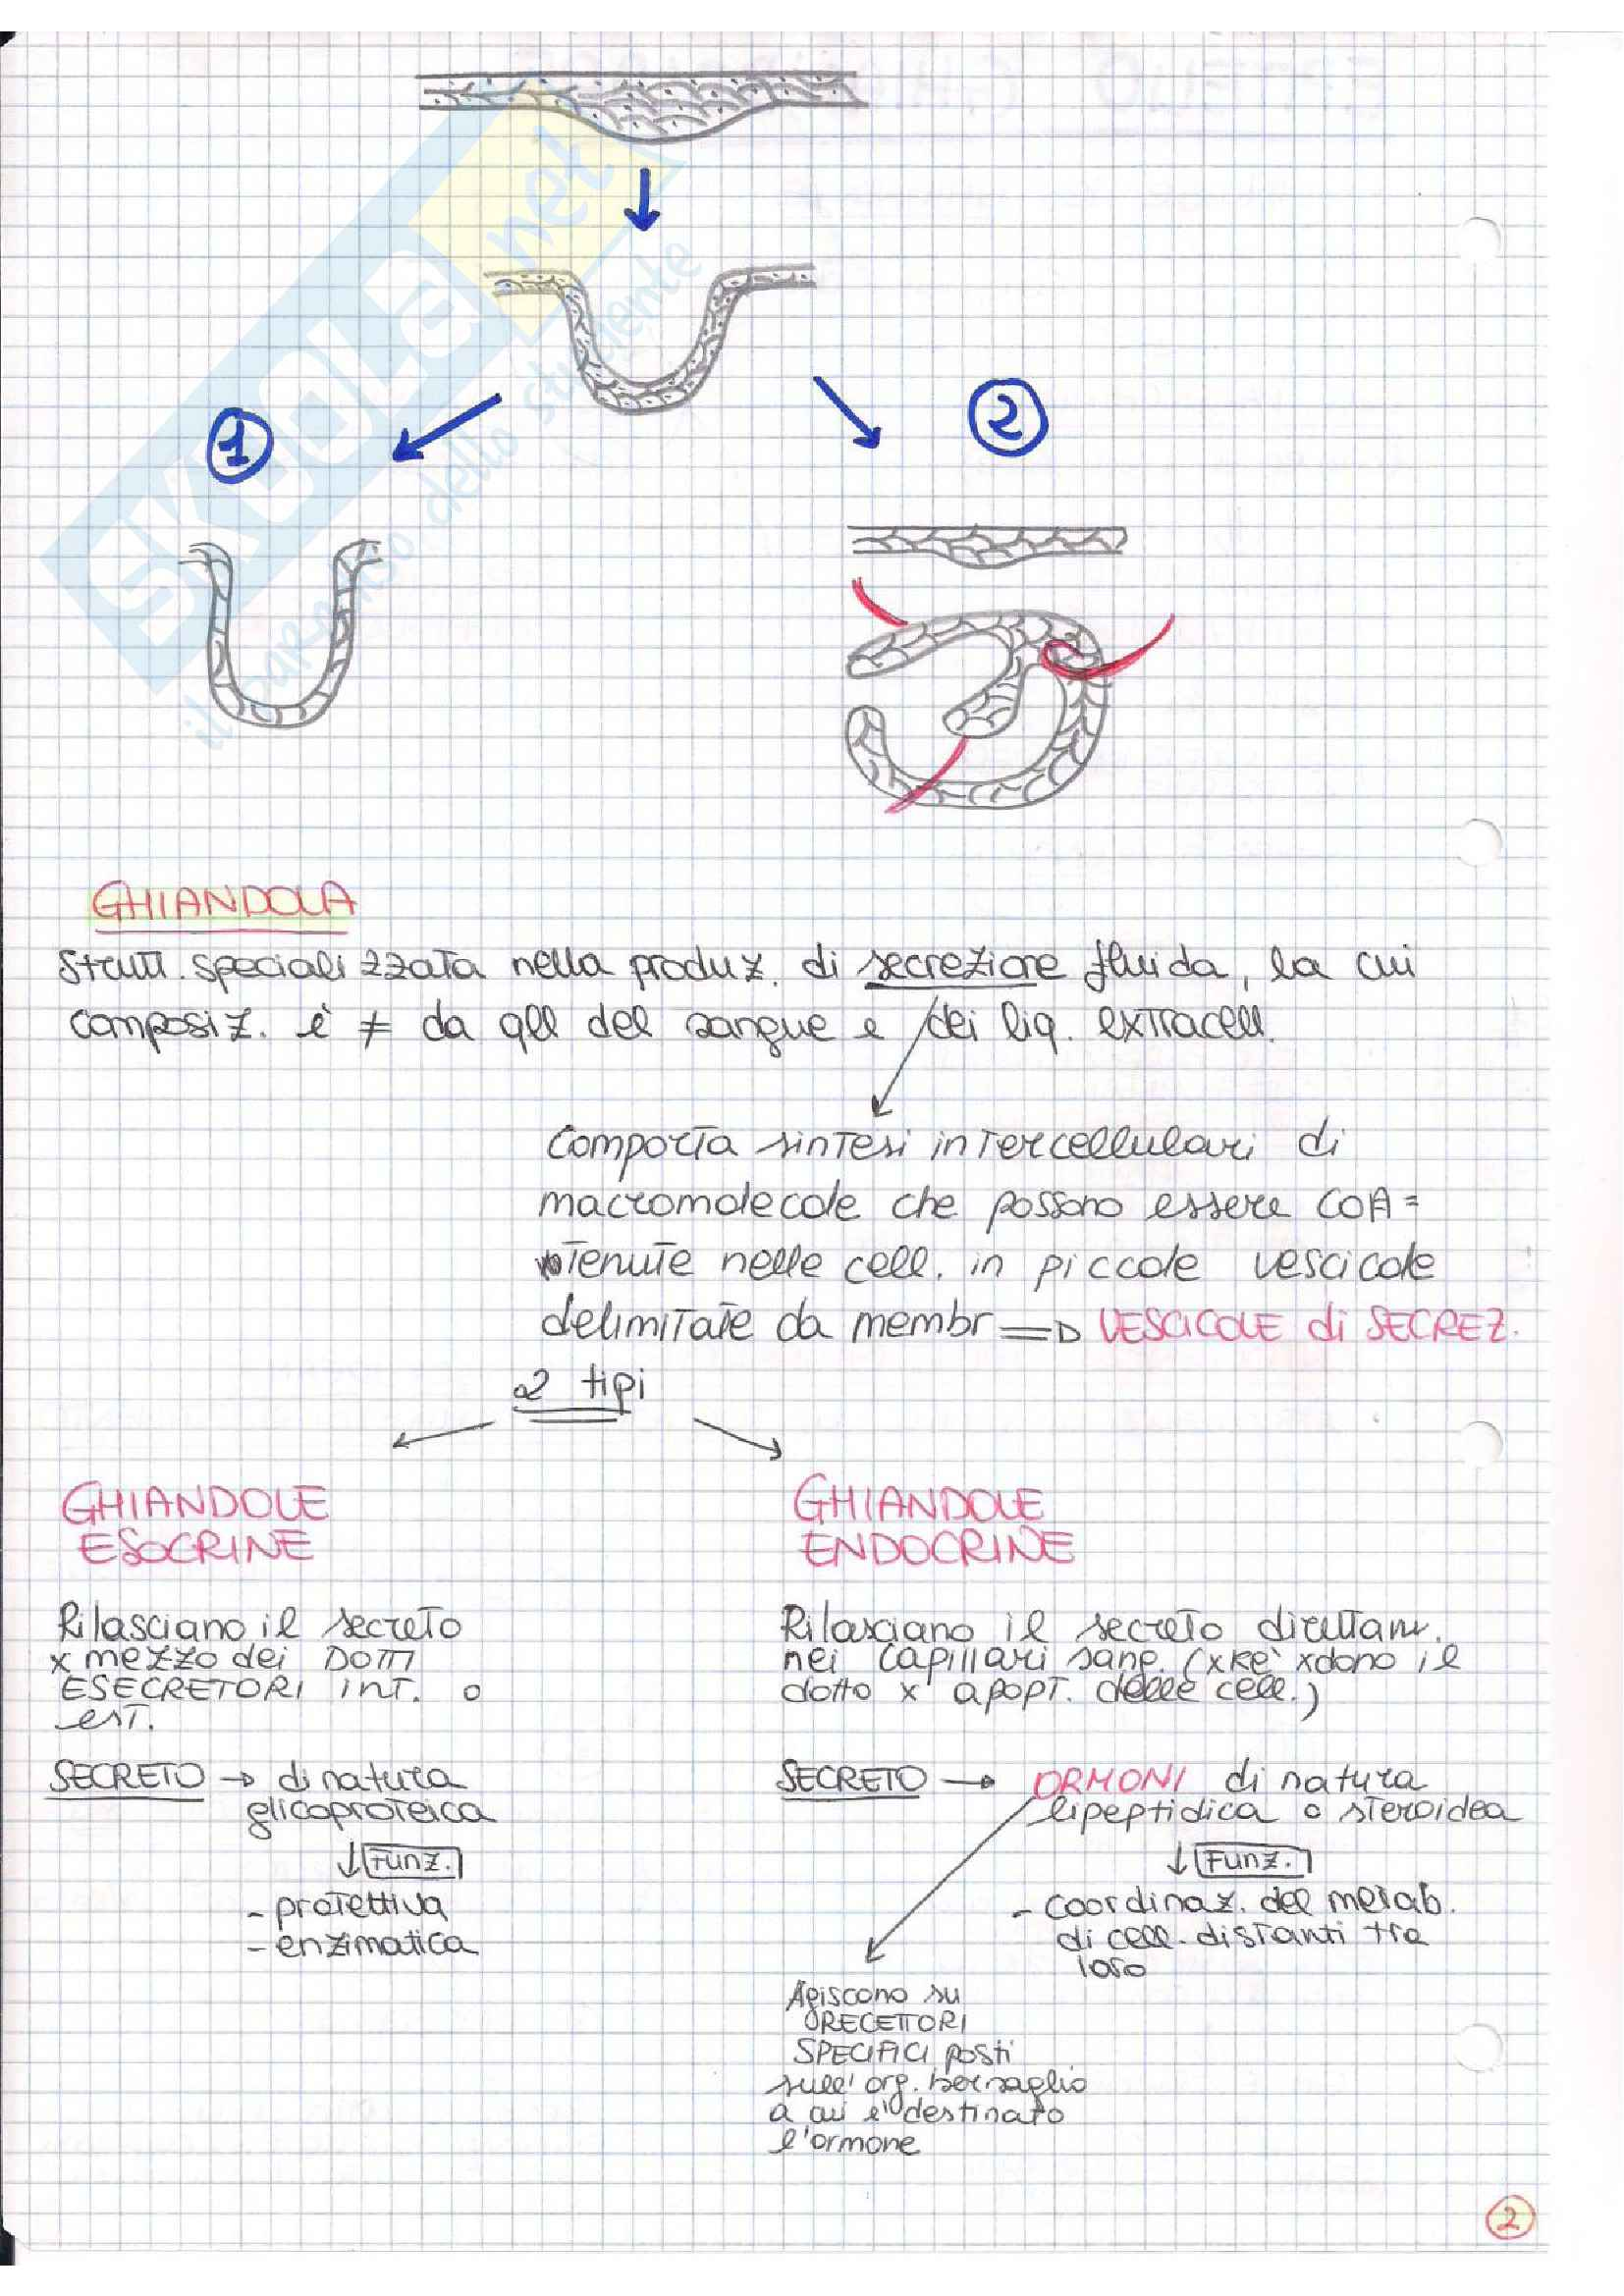 Istologia (esame istologia ed embriologia) Pag. 21